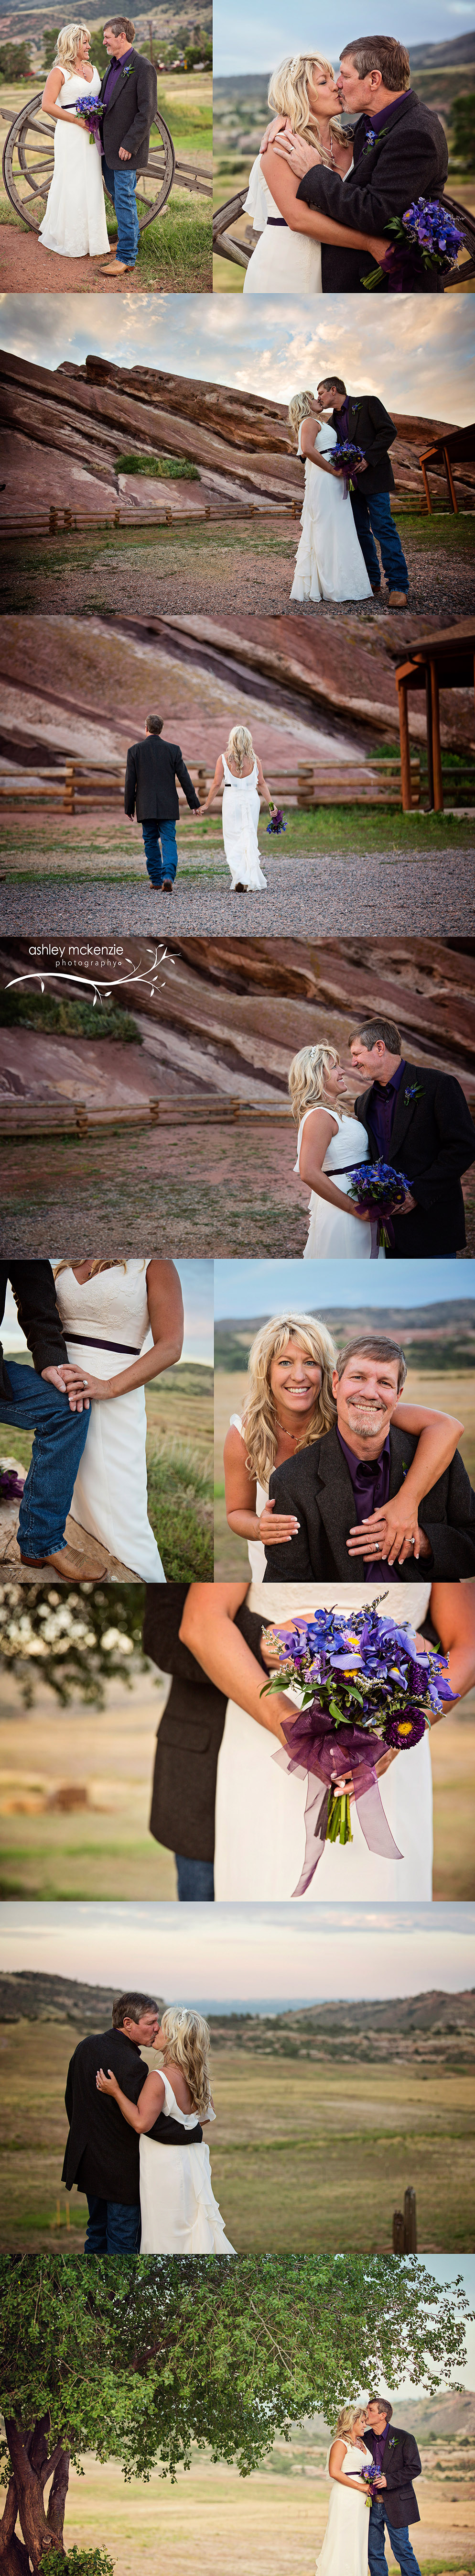 Wedding Photography by Ashley McKenzie Photography in Littleton, Colorado